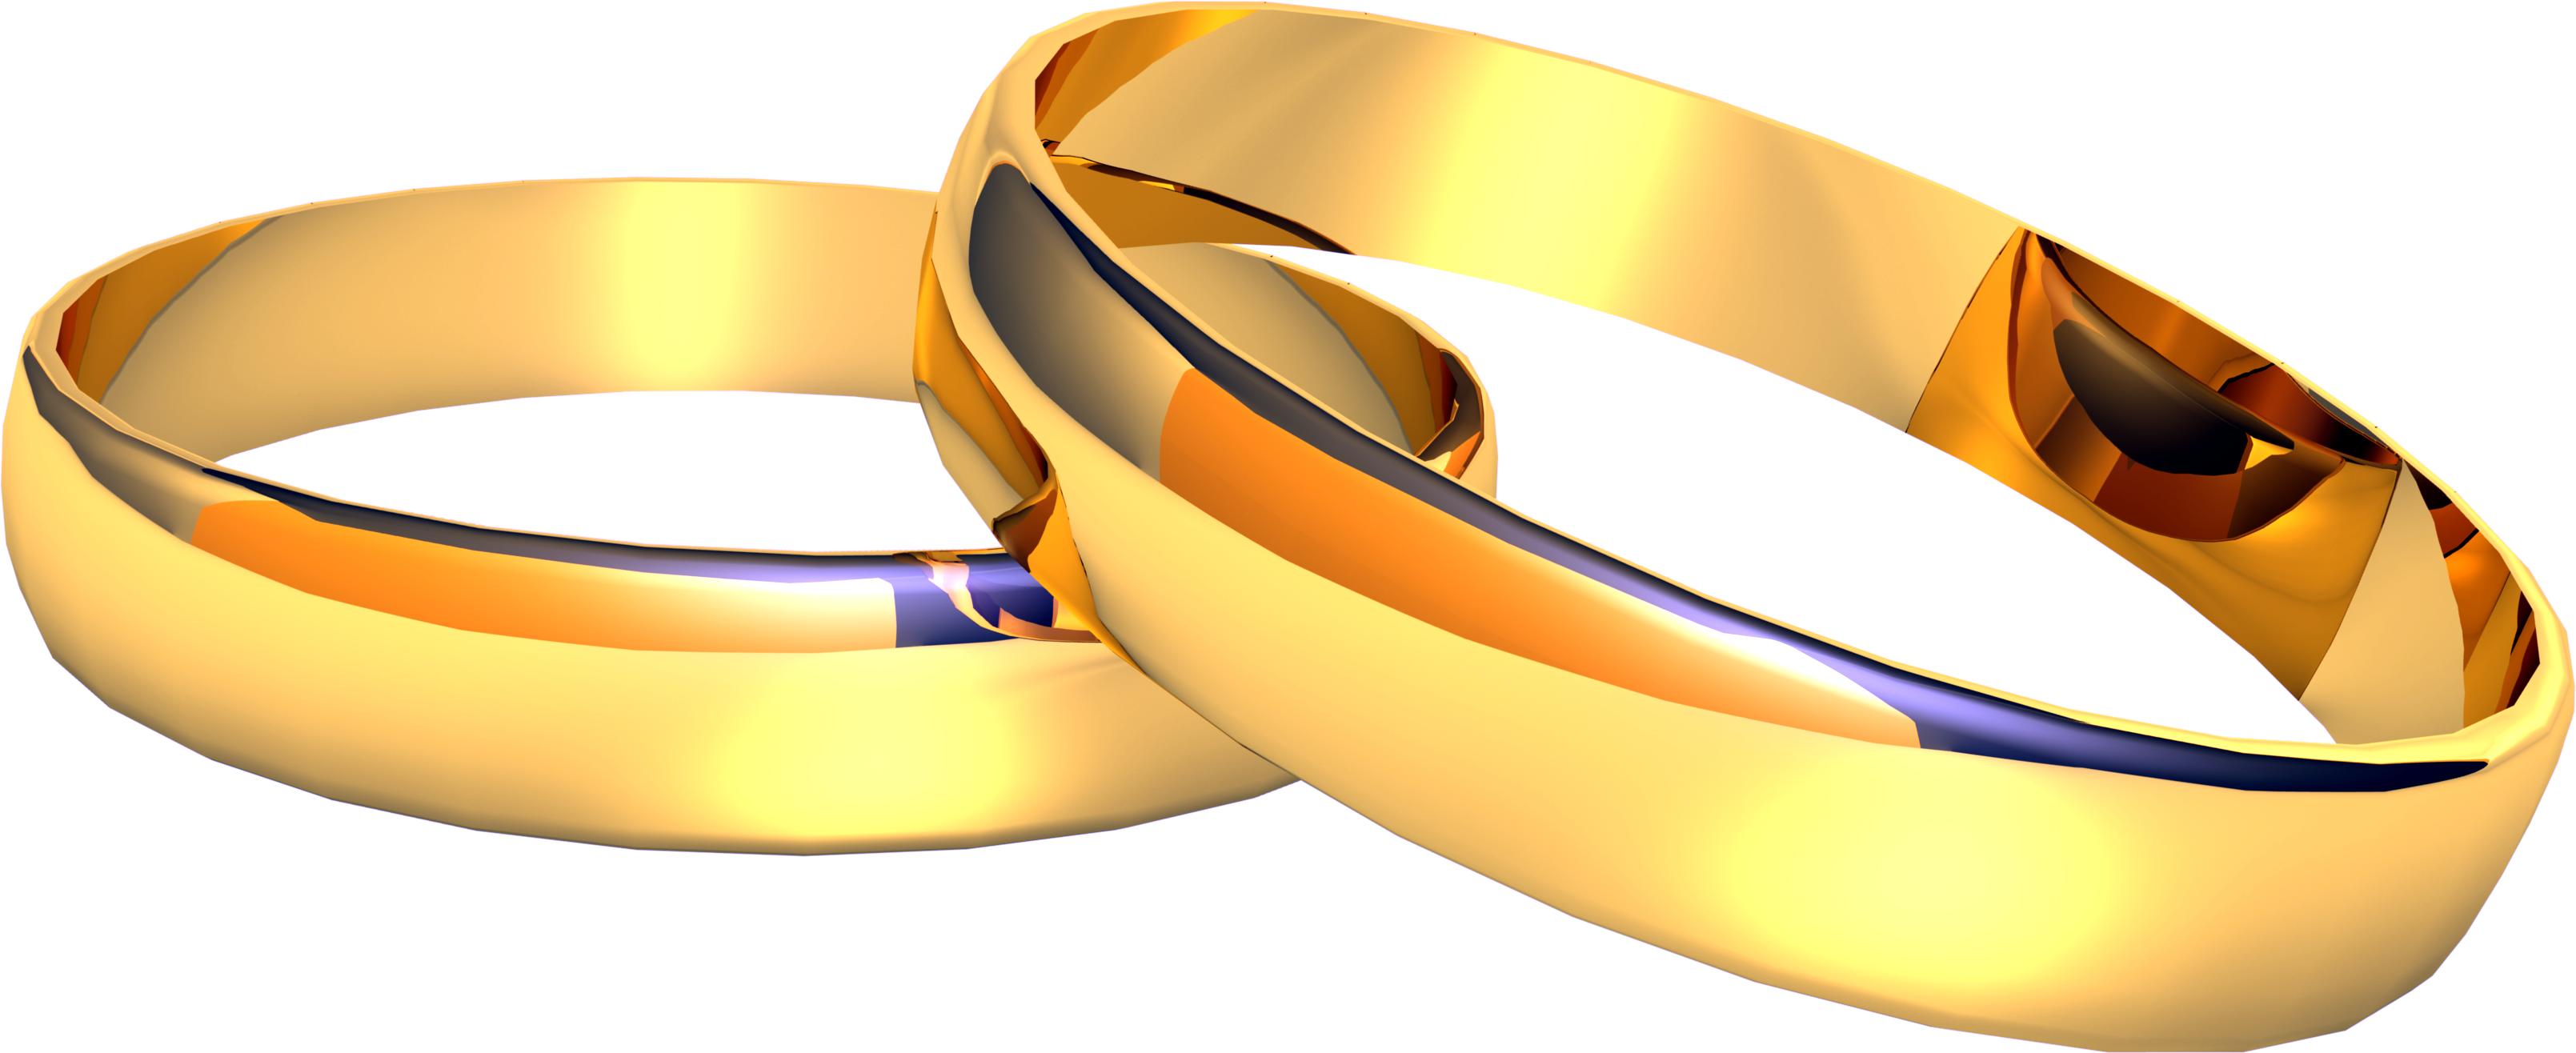 Wedding PNG Download - 83495